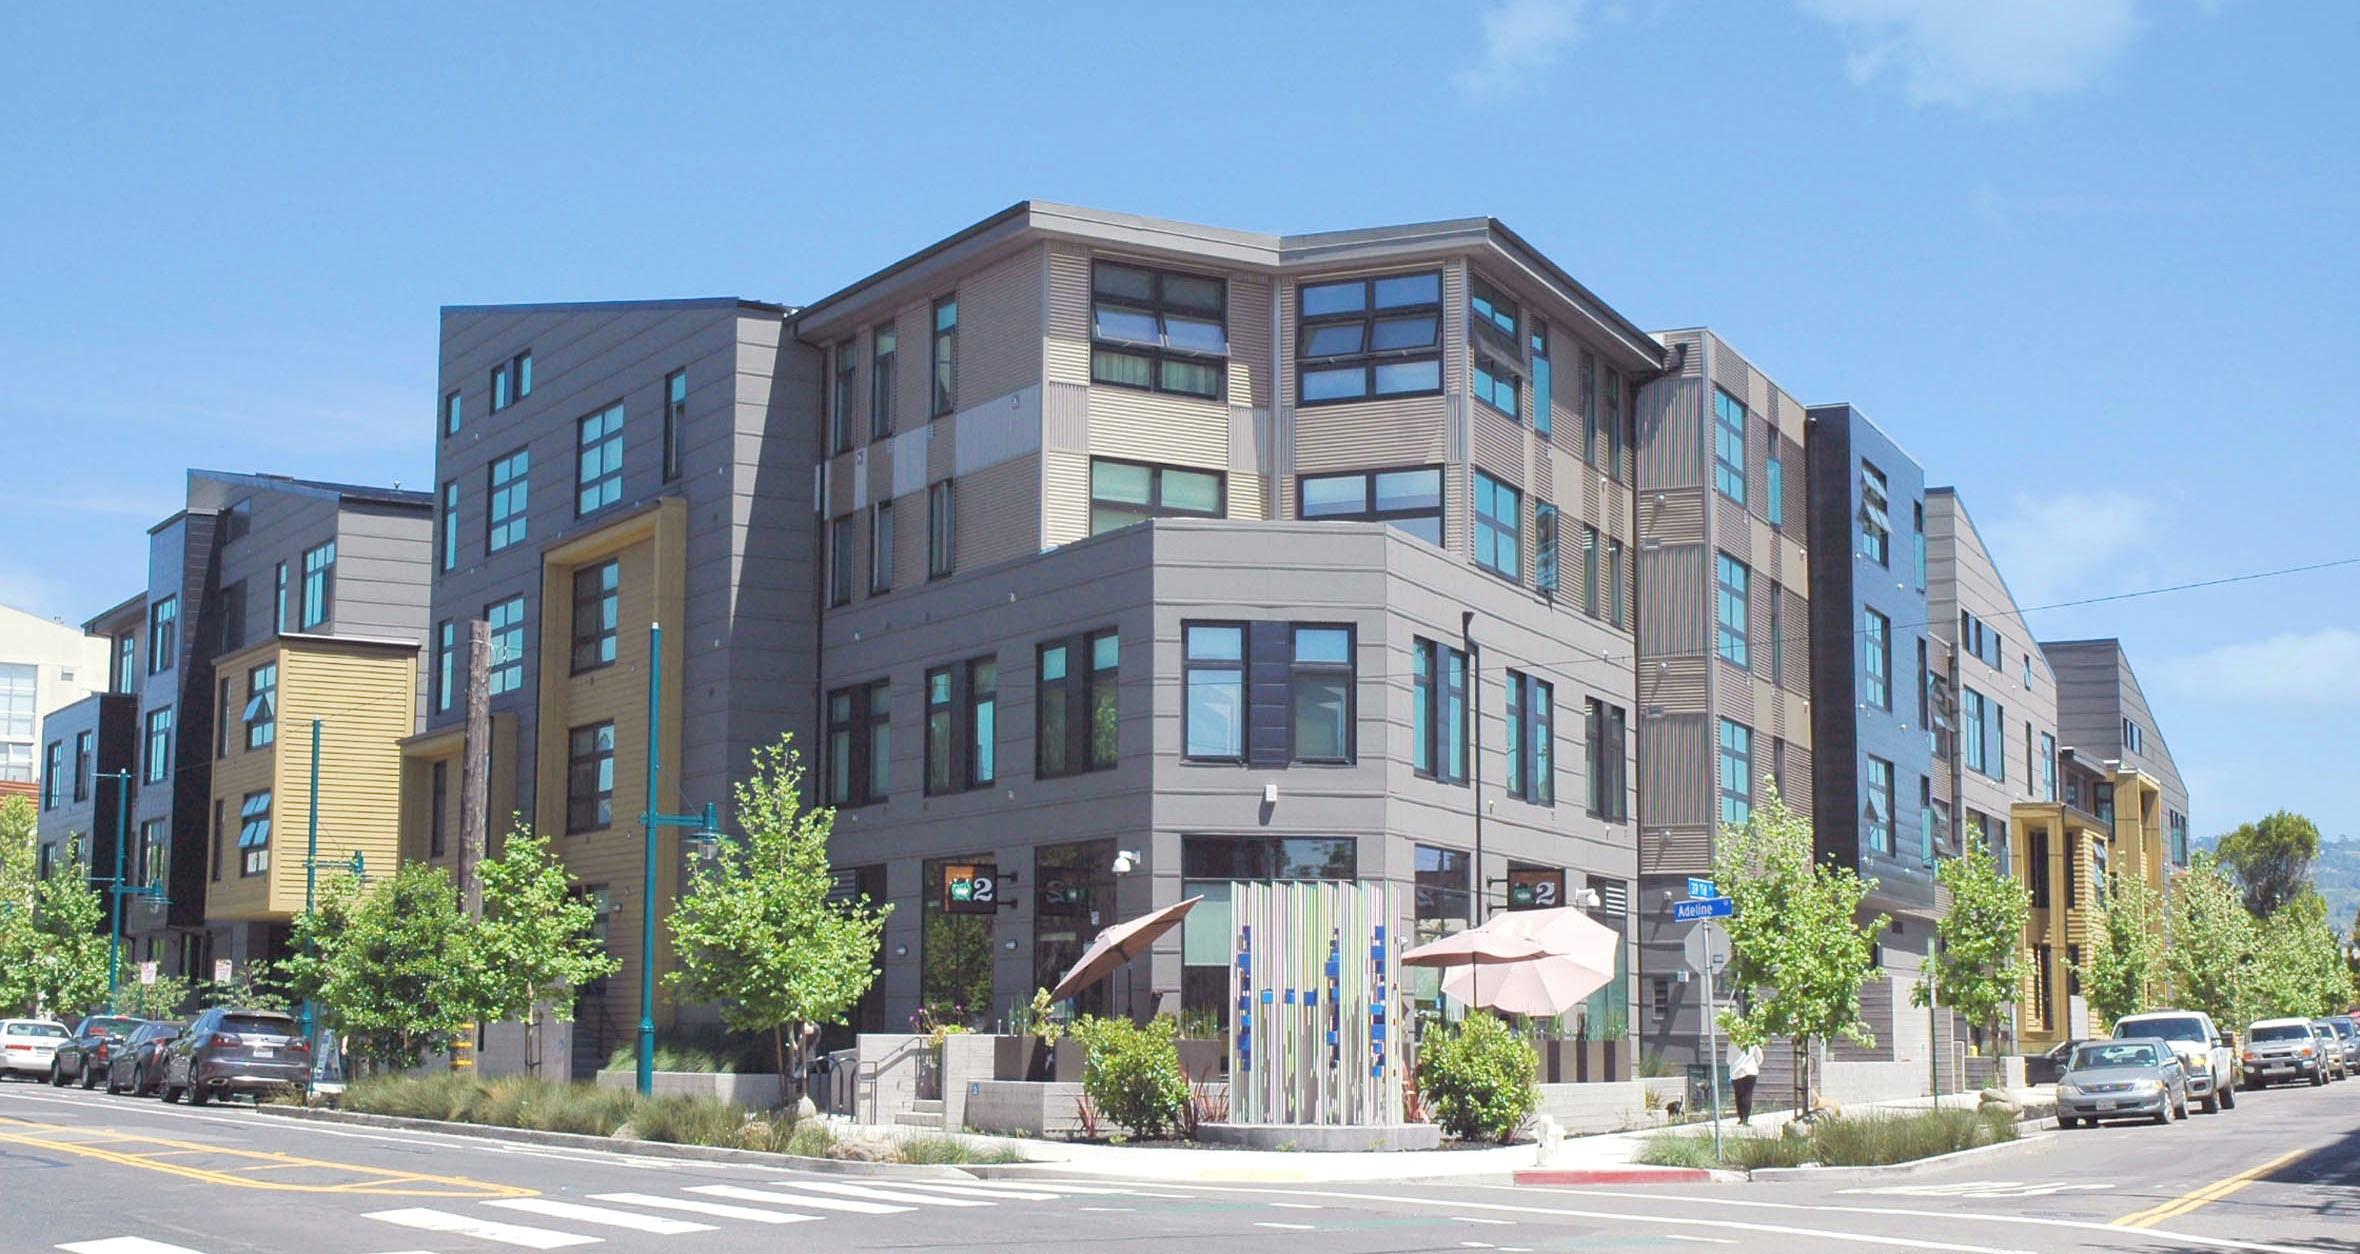 3900 ADELINE - EMERYVILLE/OAKLAND, CA